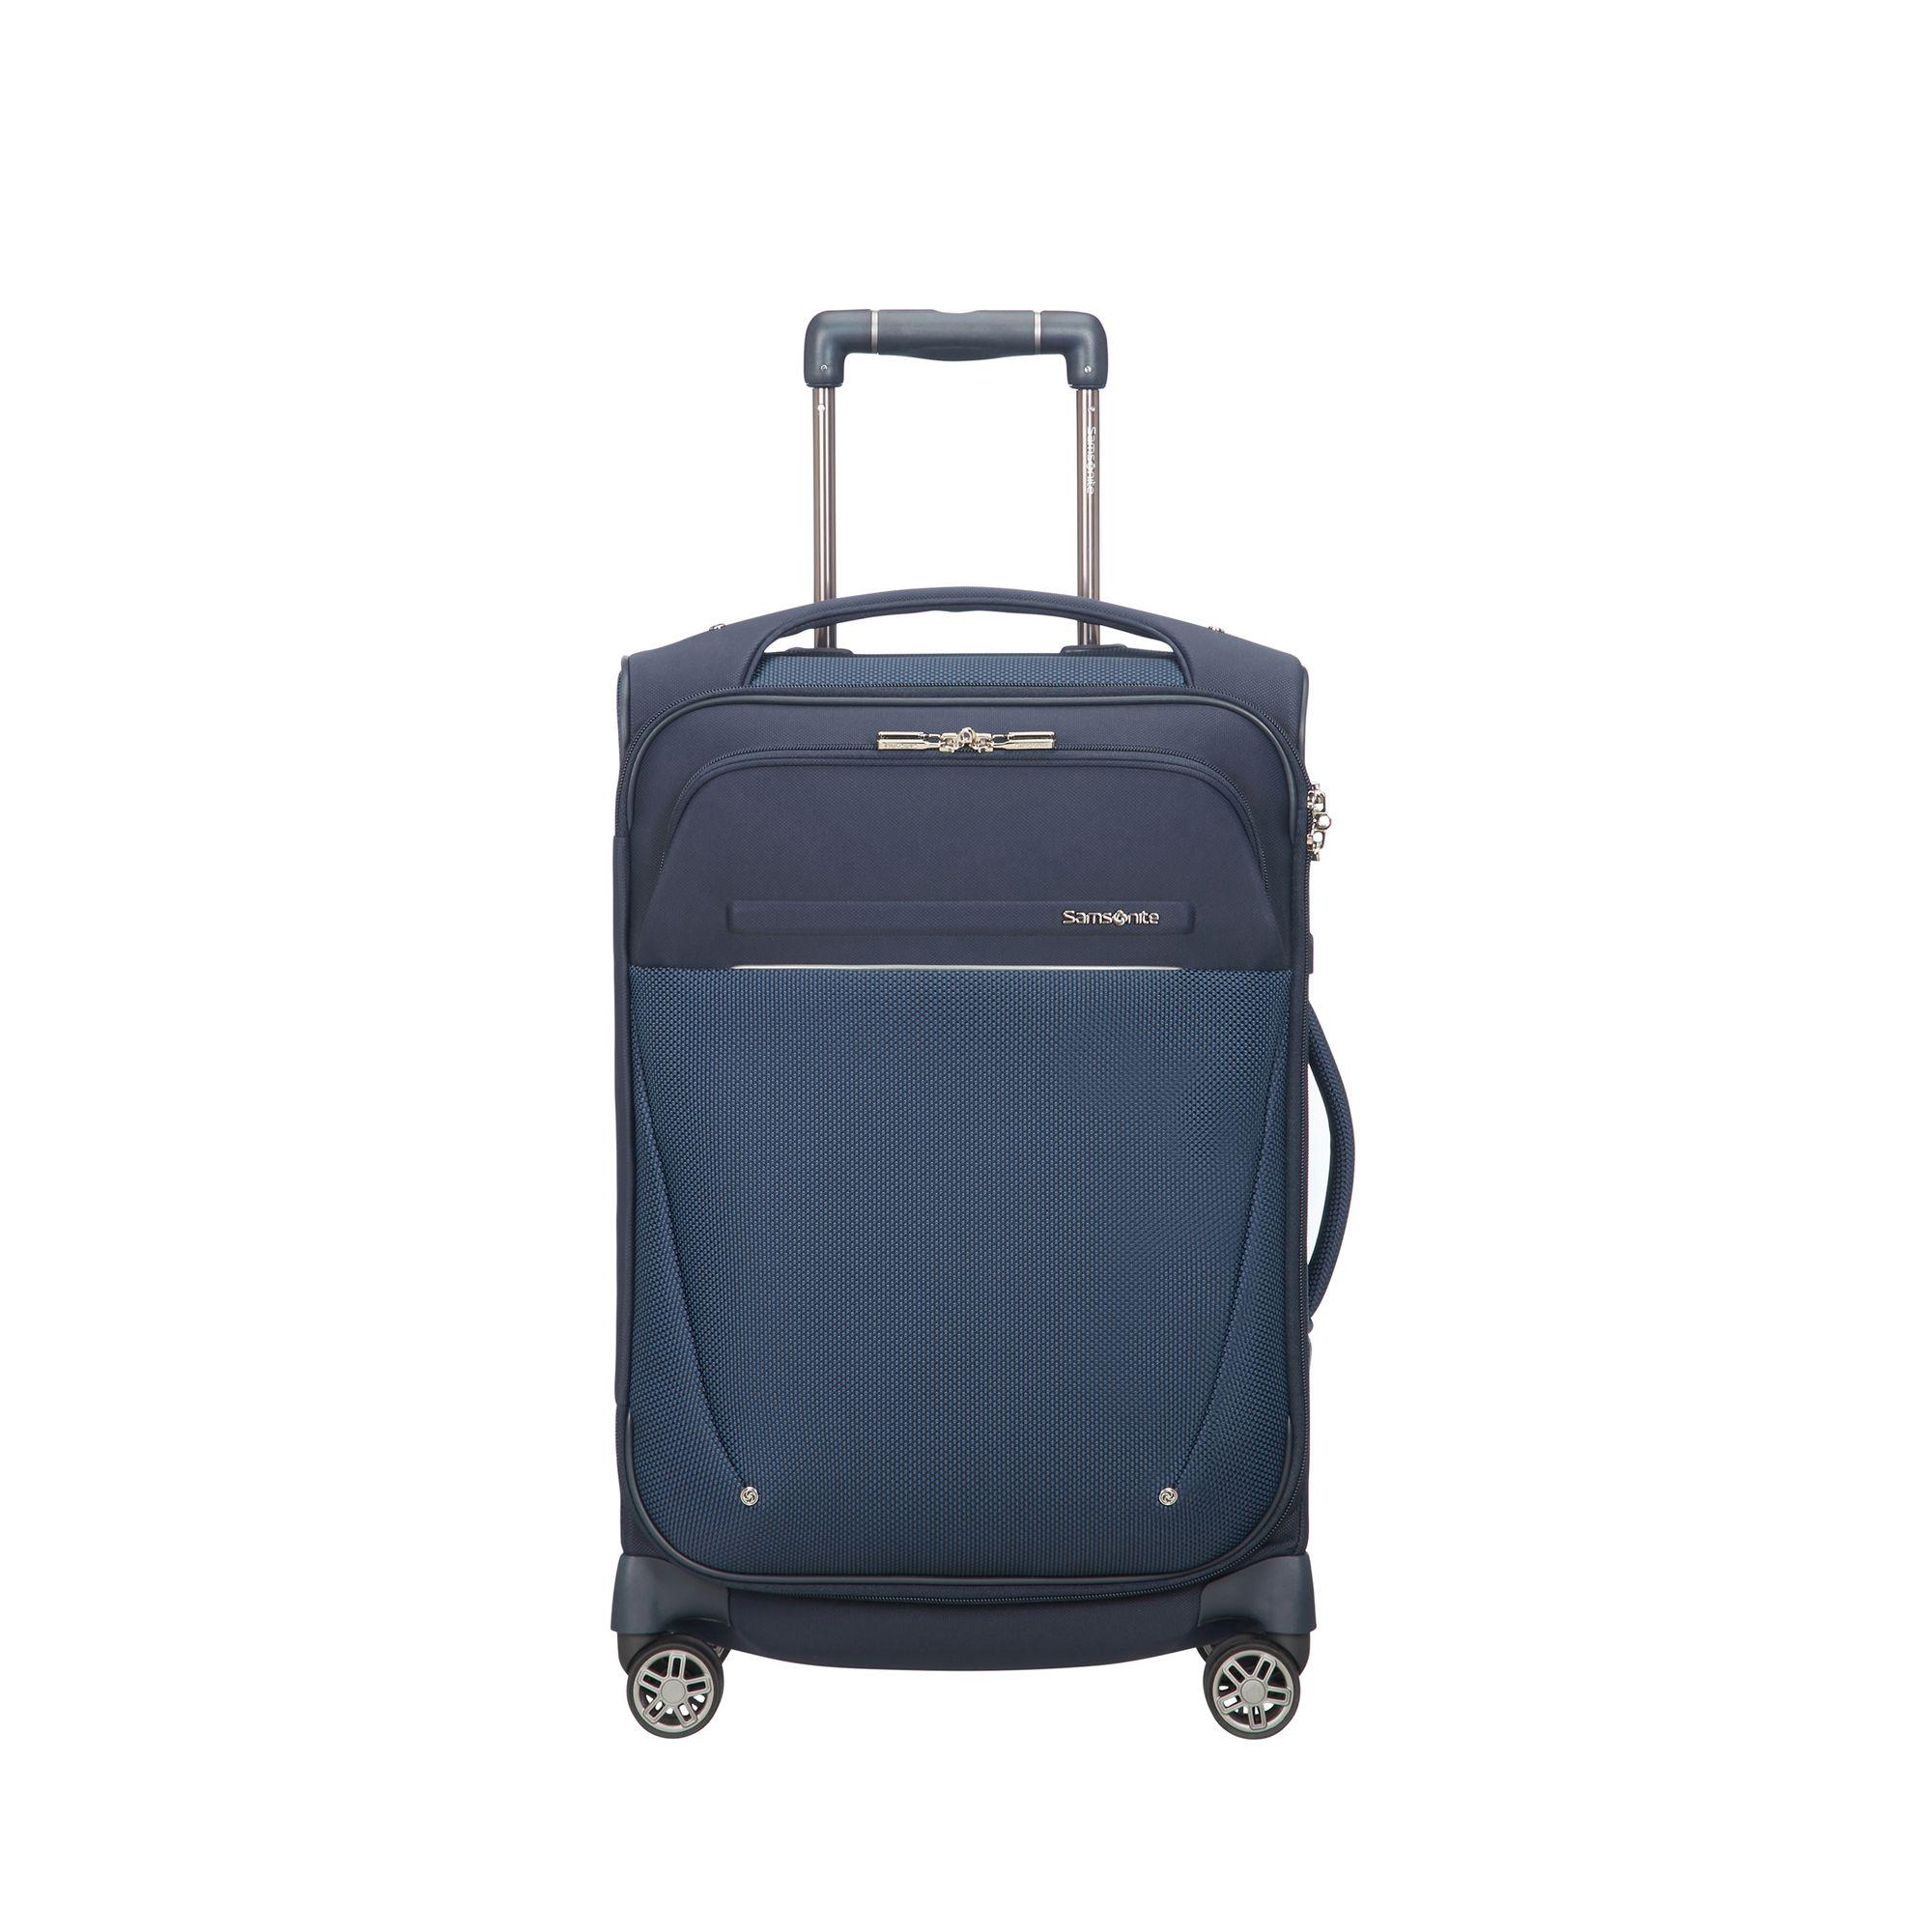 Samsonite B-Lite Icon resväska, 4 hjul, 55 cm, Mörkblå